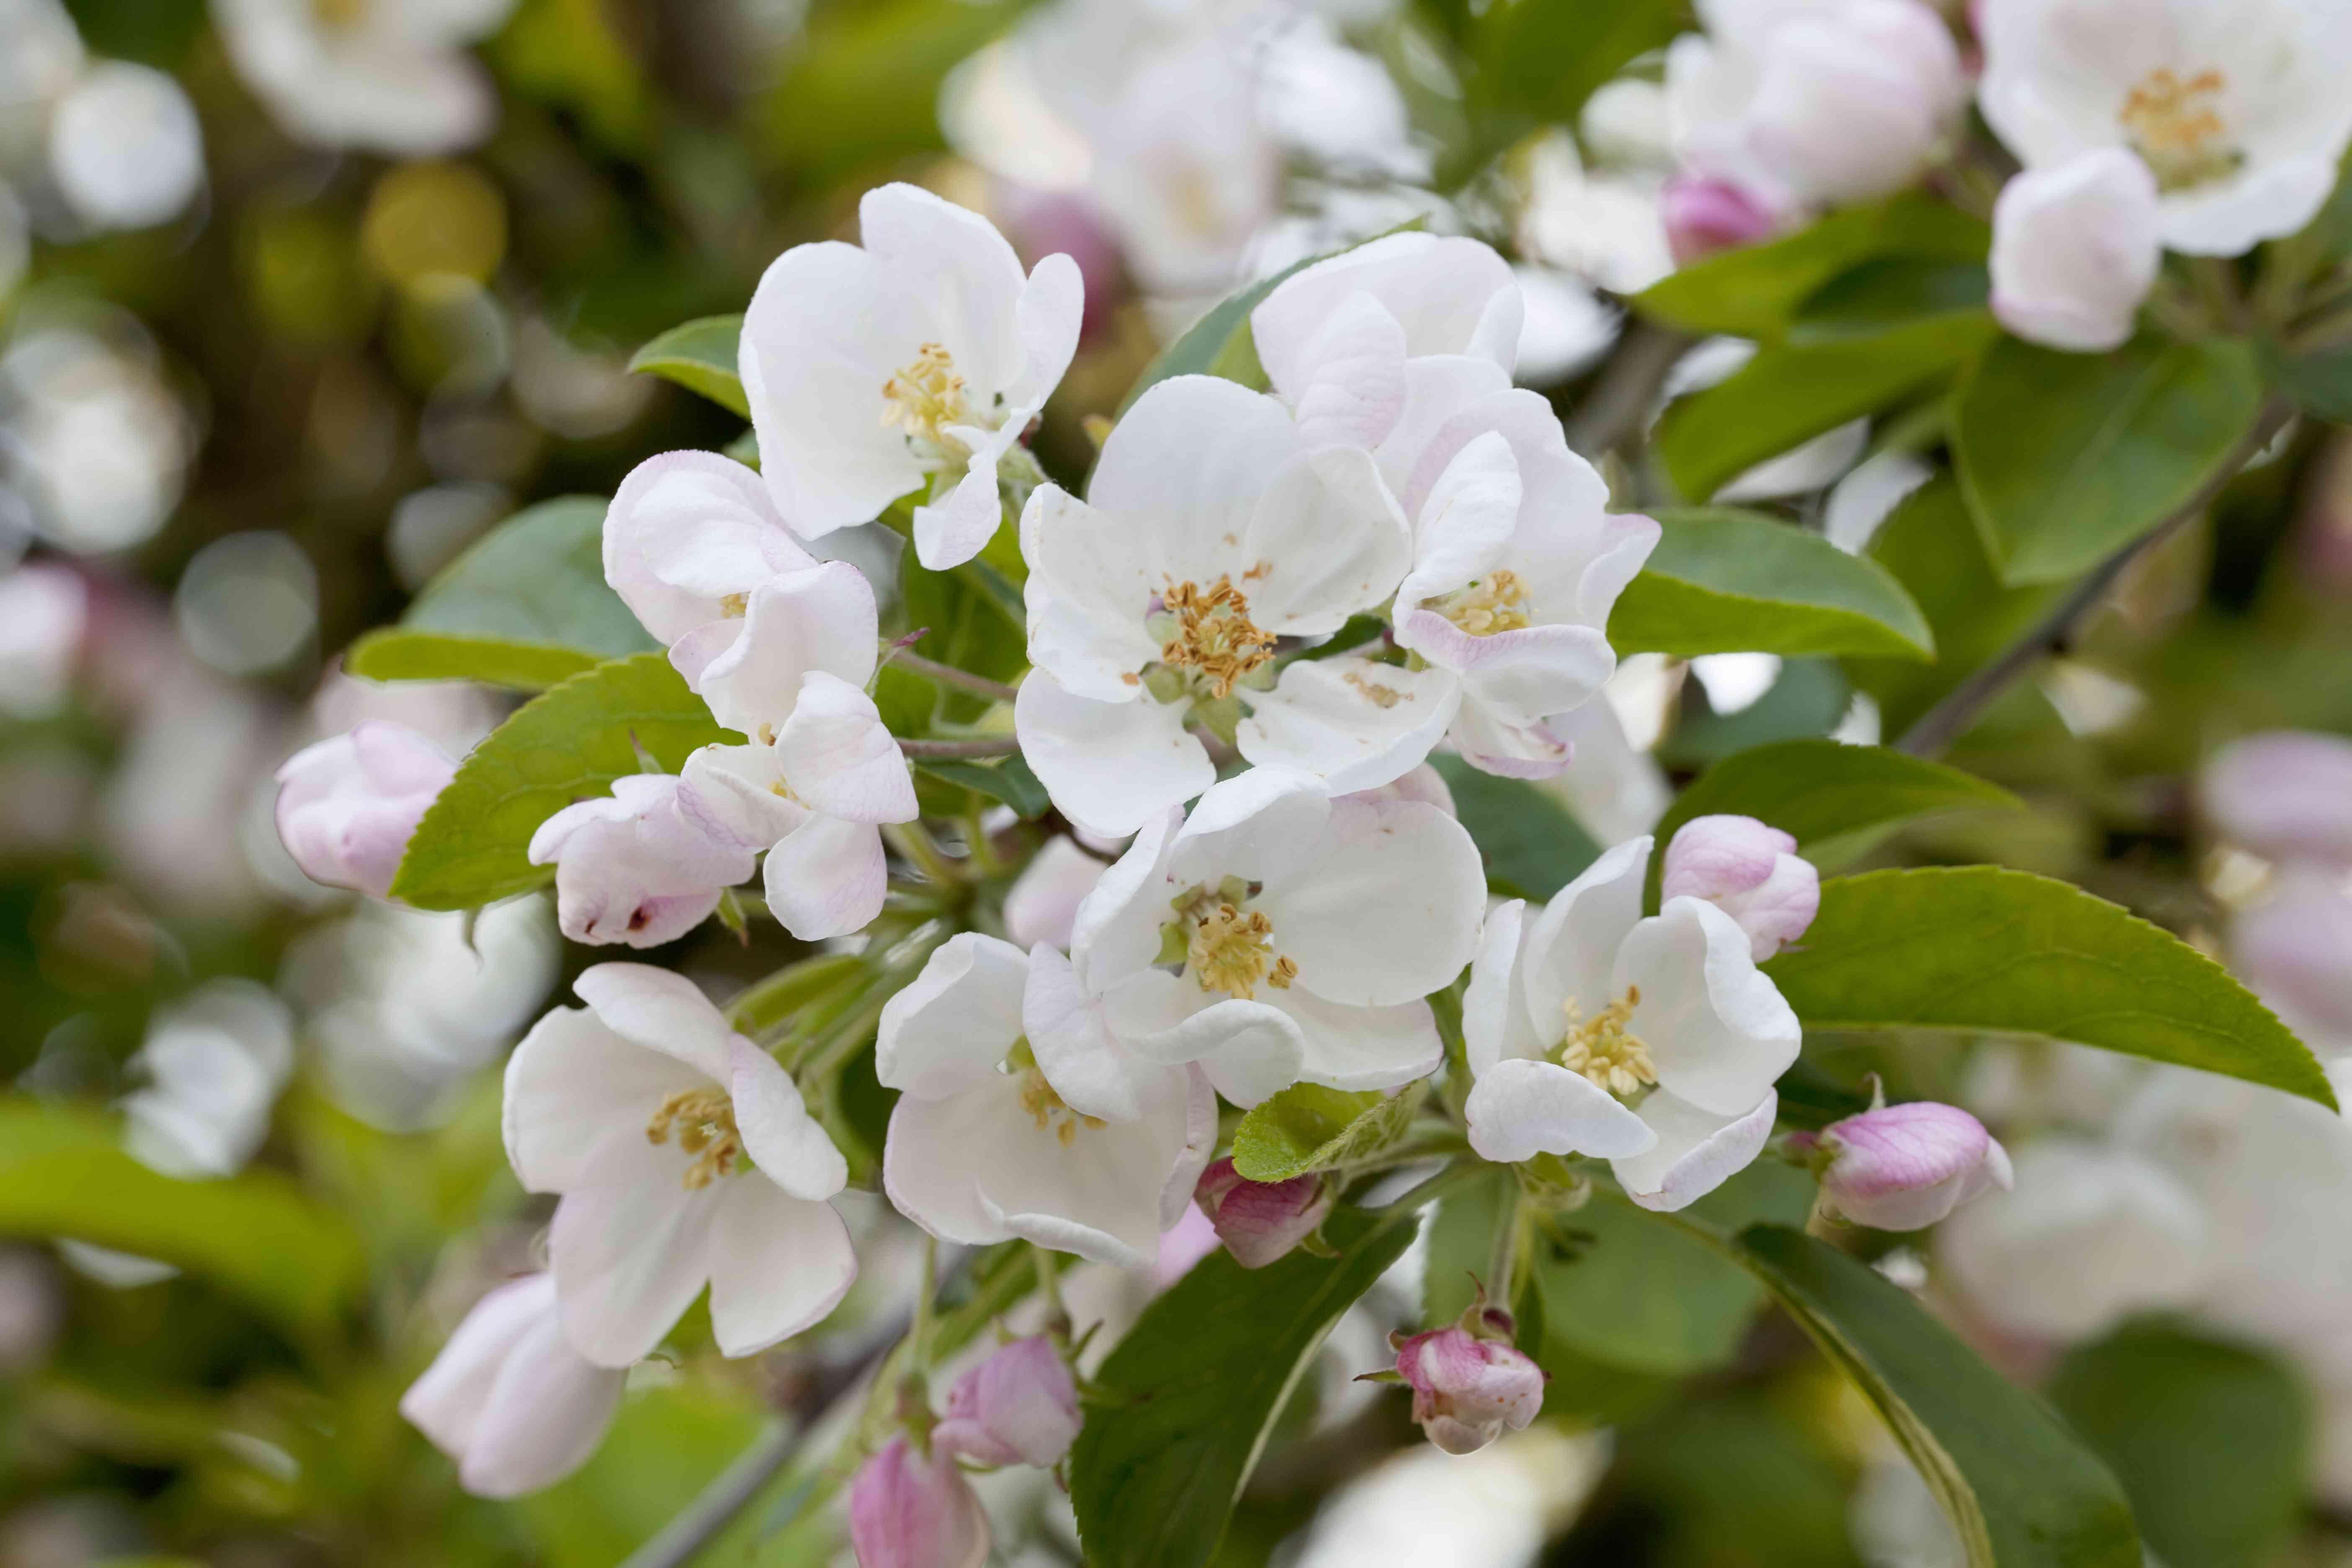 Crab Apple Tree (Malus pumila) in Blossom